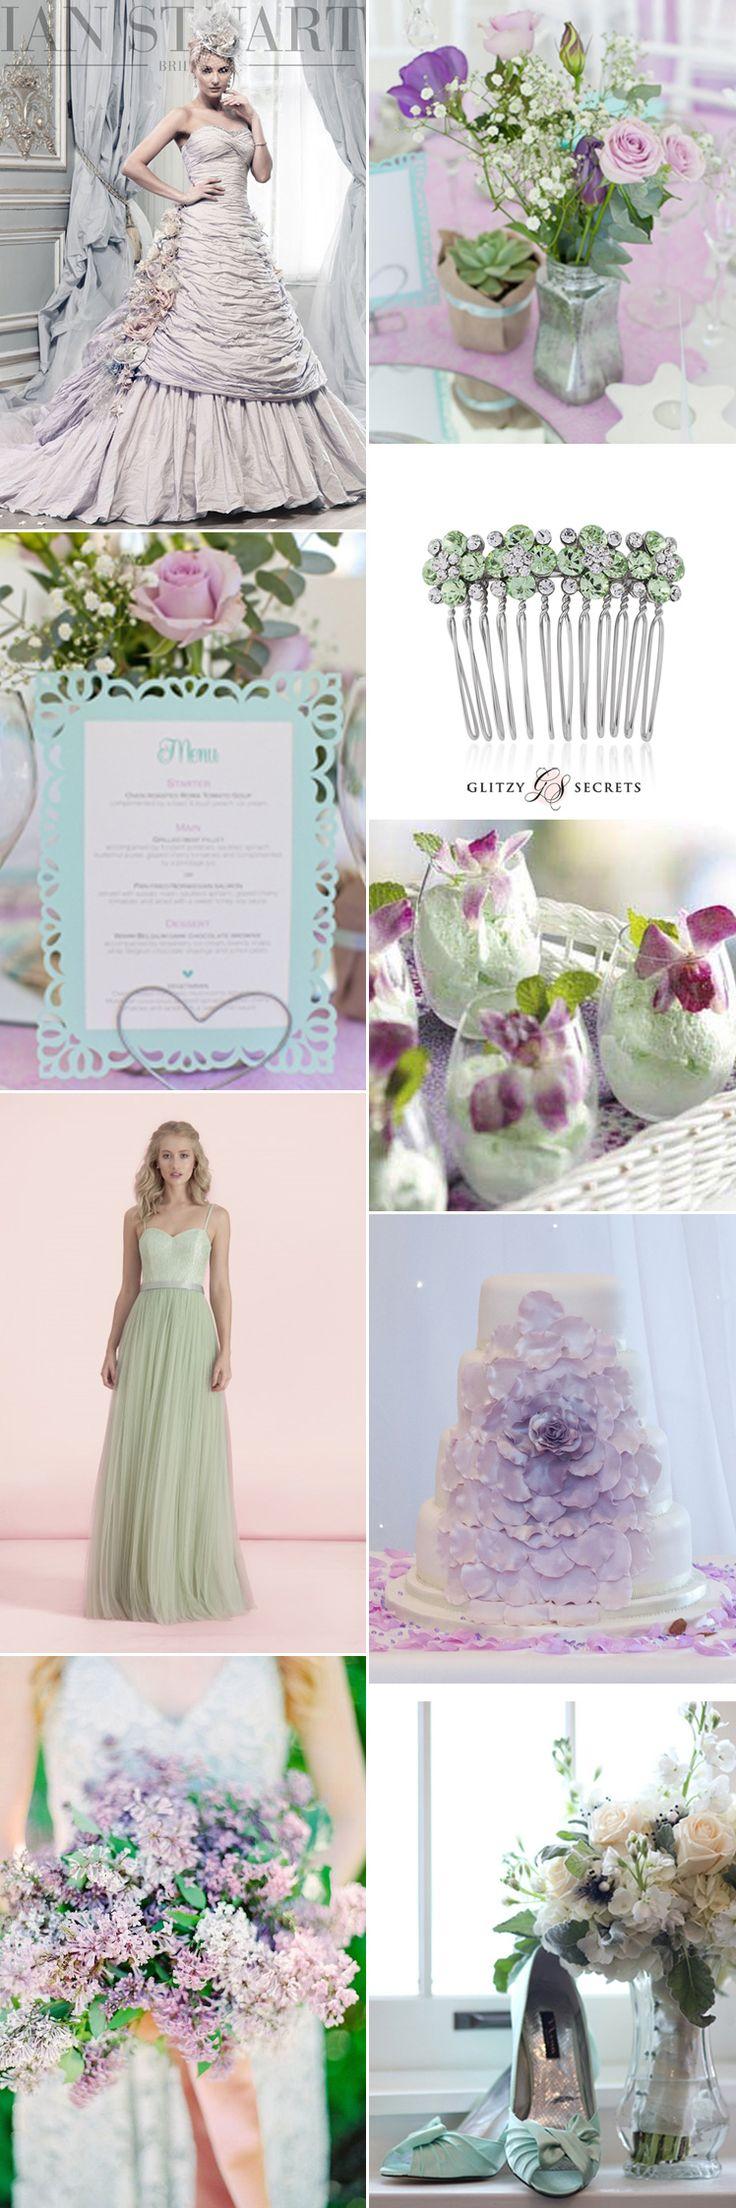 Fabulous Mint Green And Lilac Wedding Ideas On GS Inspiration   Glitzy  Secrets